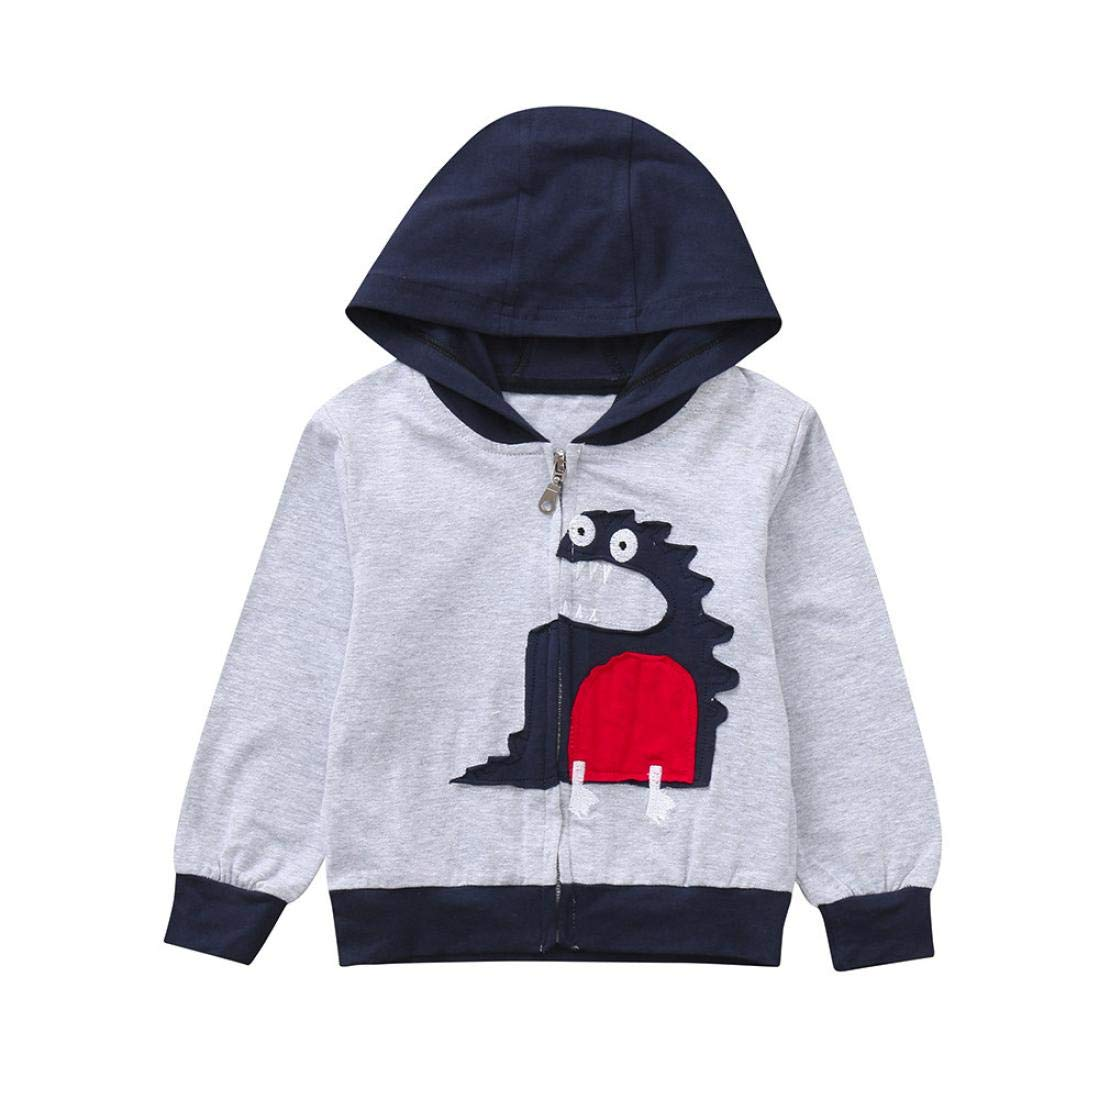 Suma-ma 2Colors Baby Boys Girls Clothes Coat-Cartoon Dinosaur Hooded Zipper Pocket Tops (18M-6T)